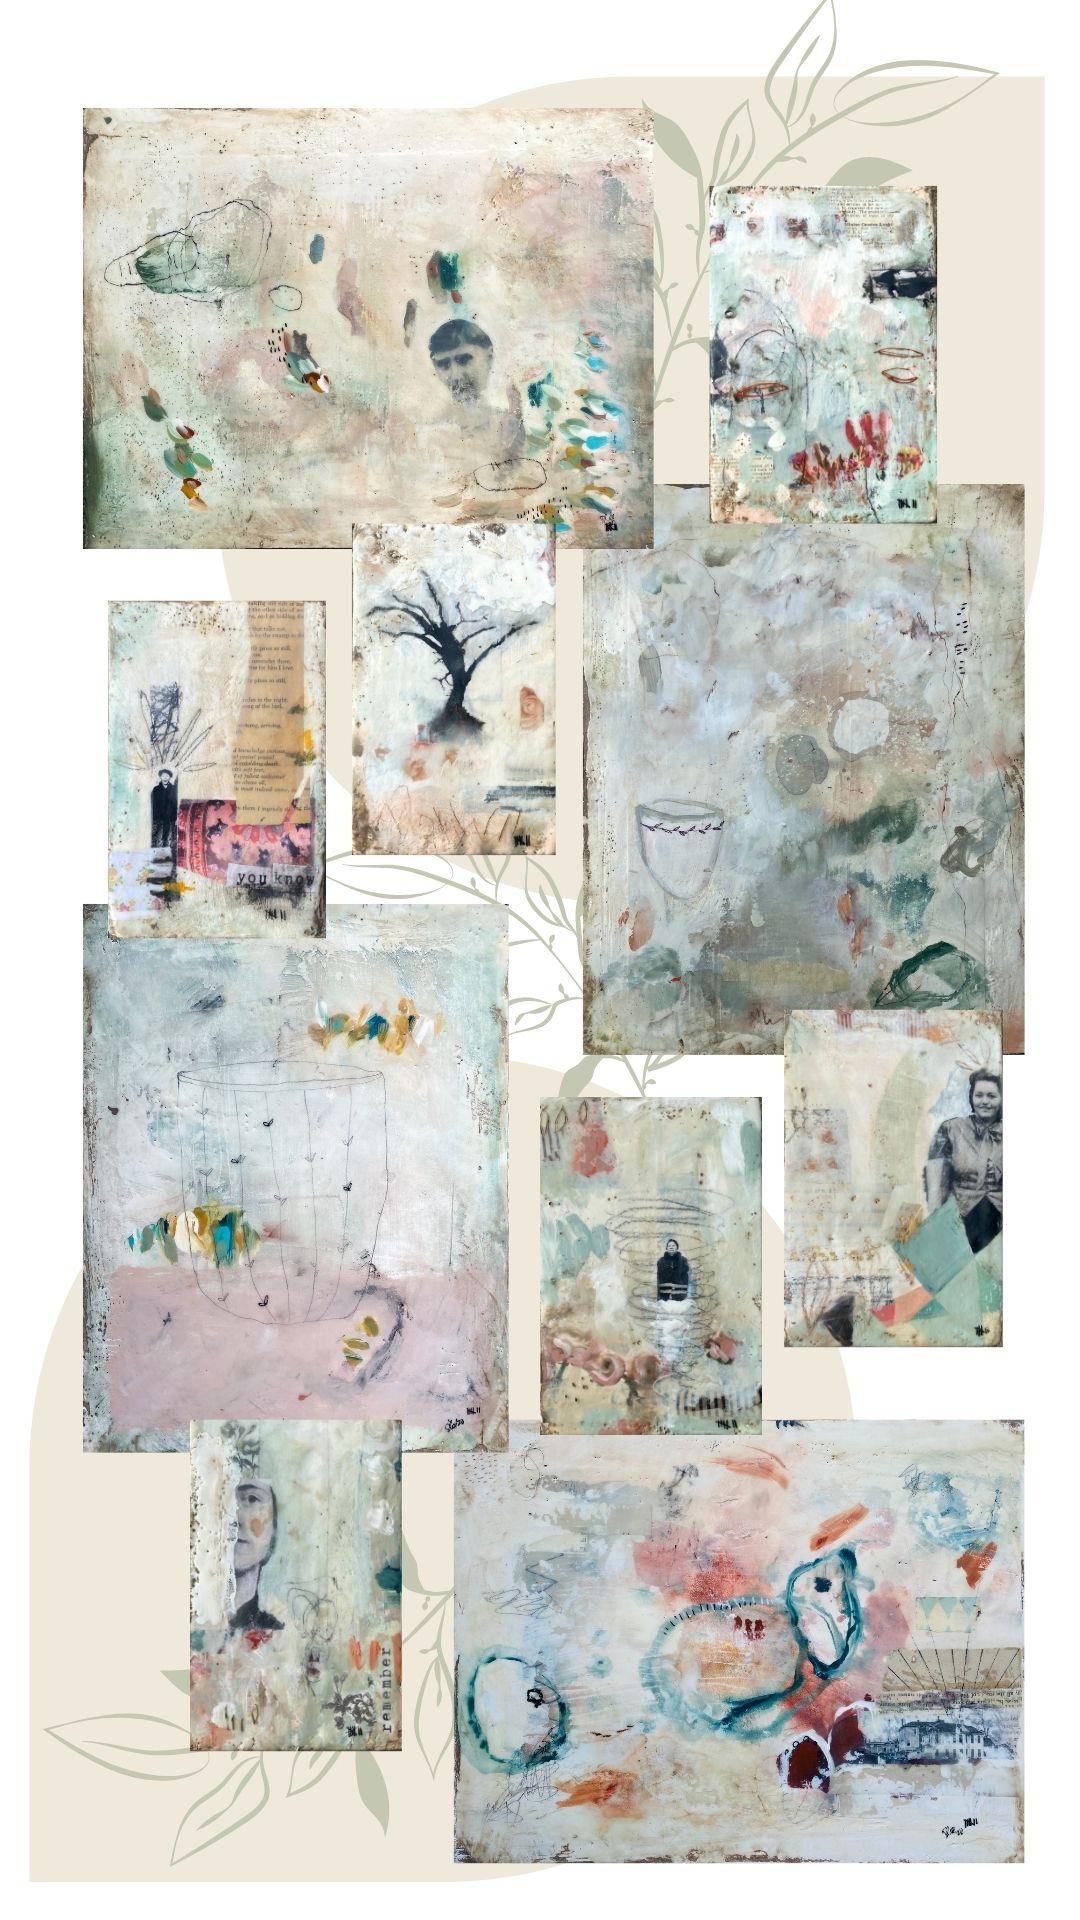 Originals by Stephanie Lee